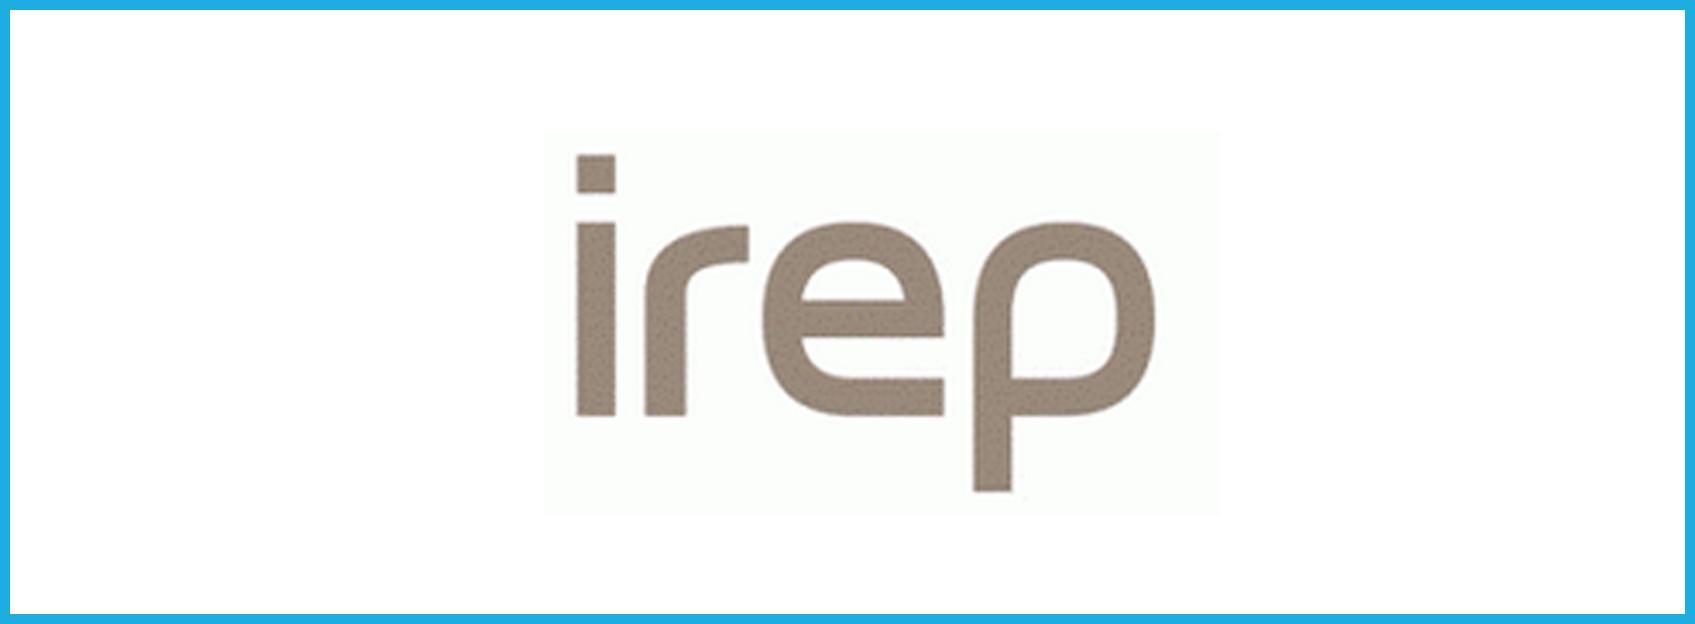 IREP, MOBILE 2012